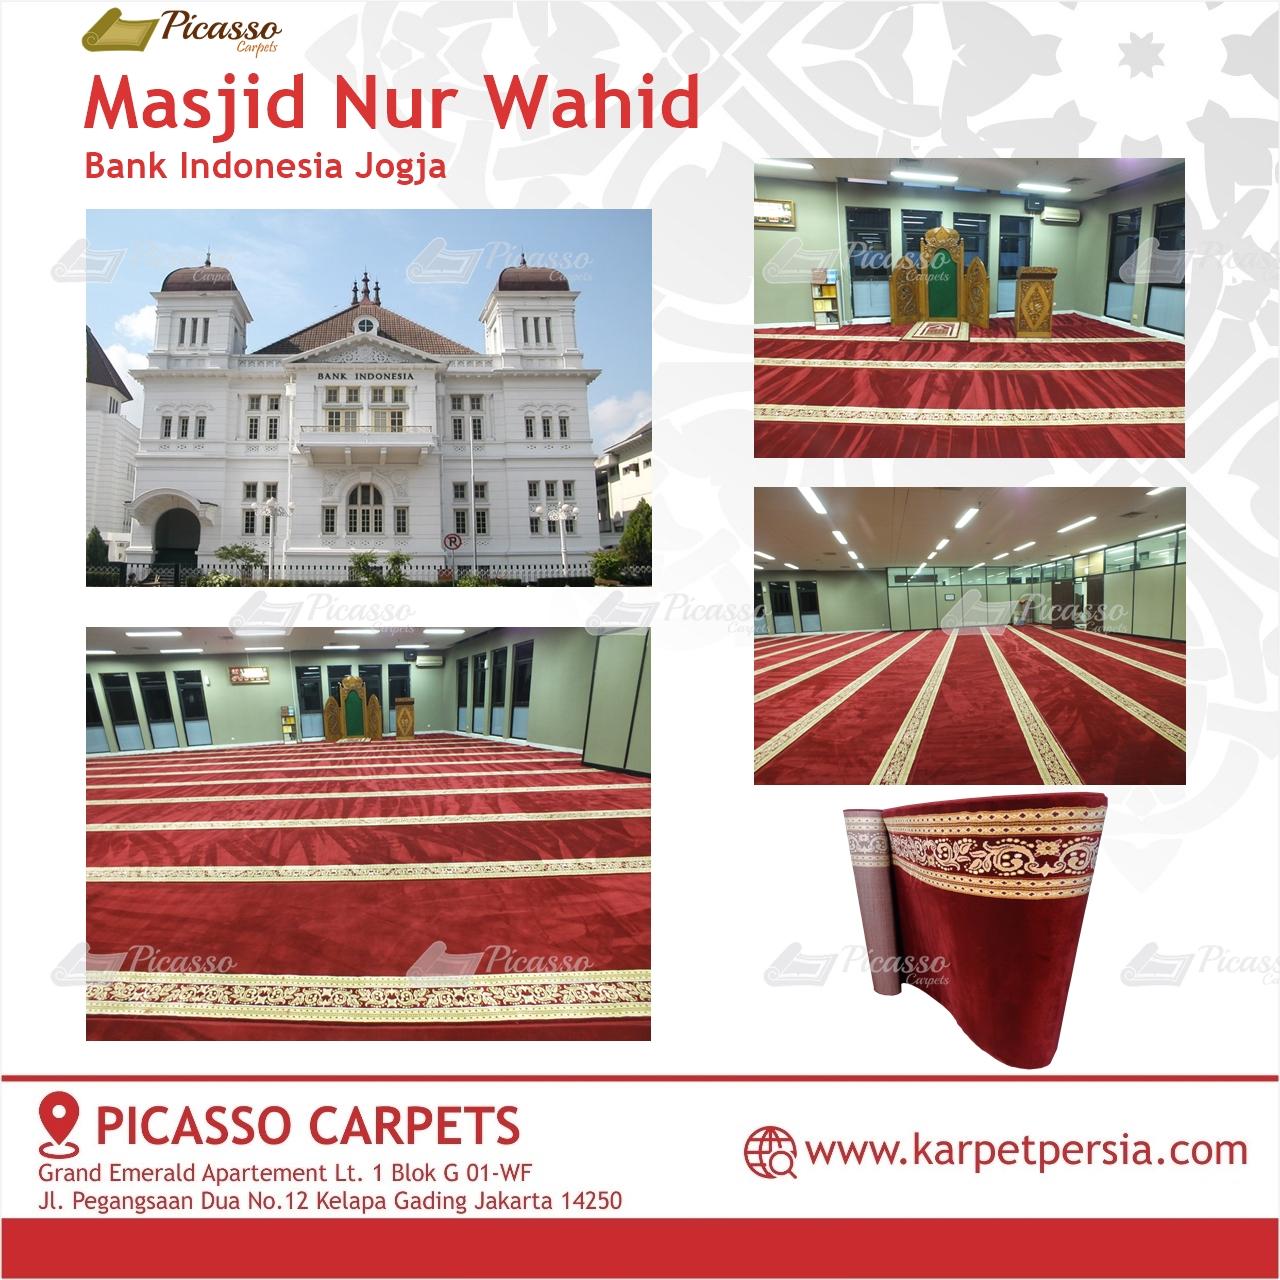 Karpet Sajadah Merah Masjid Nur Wahid Bank Indonesia Jogja